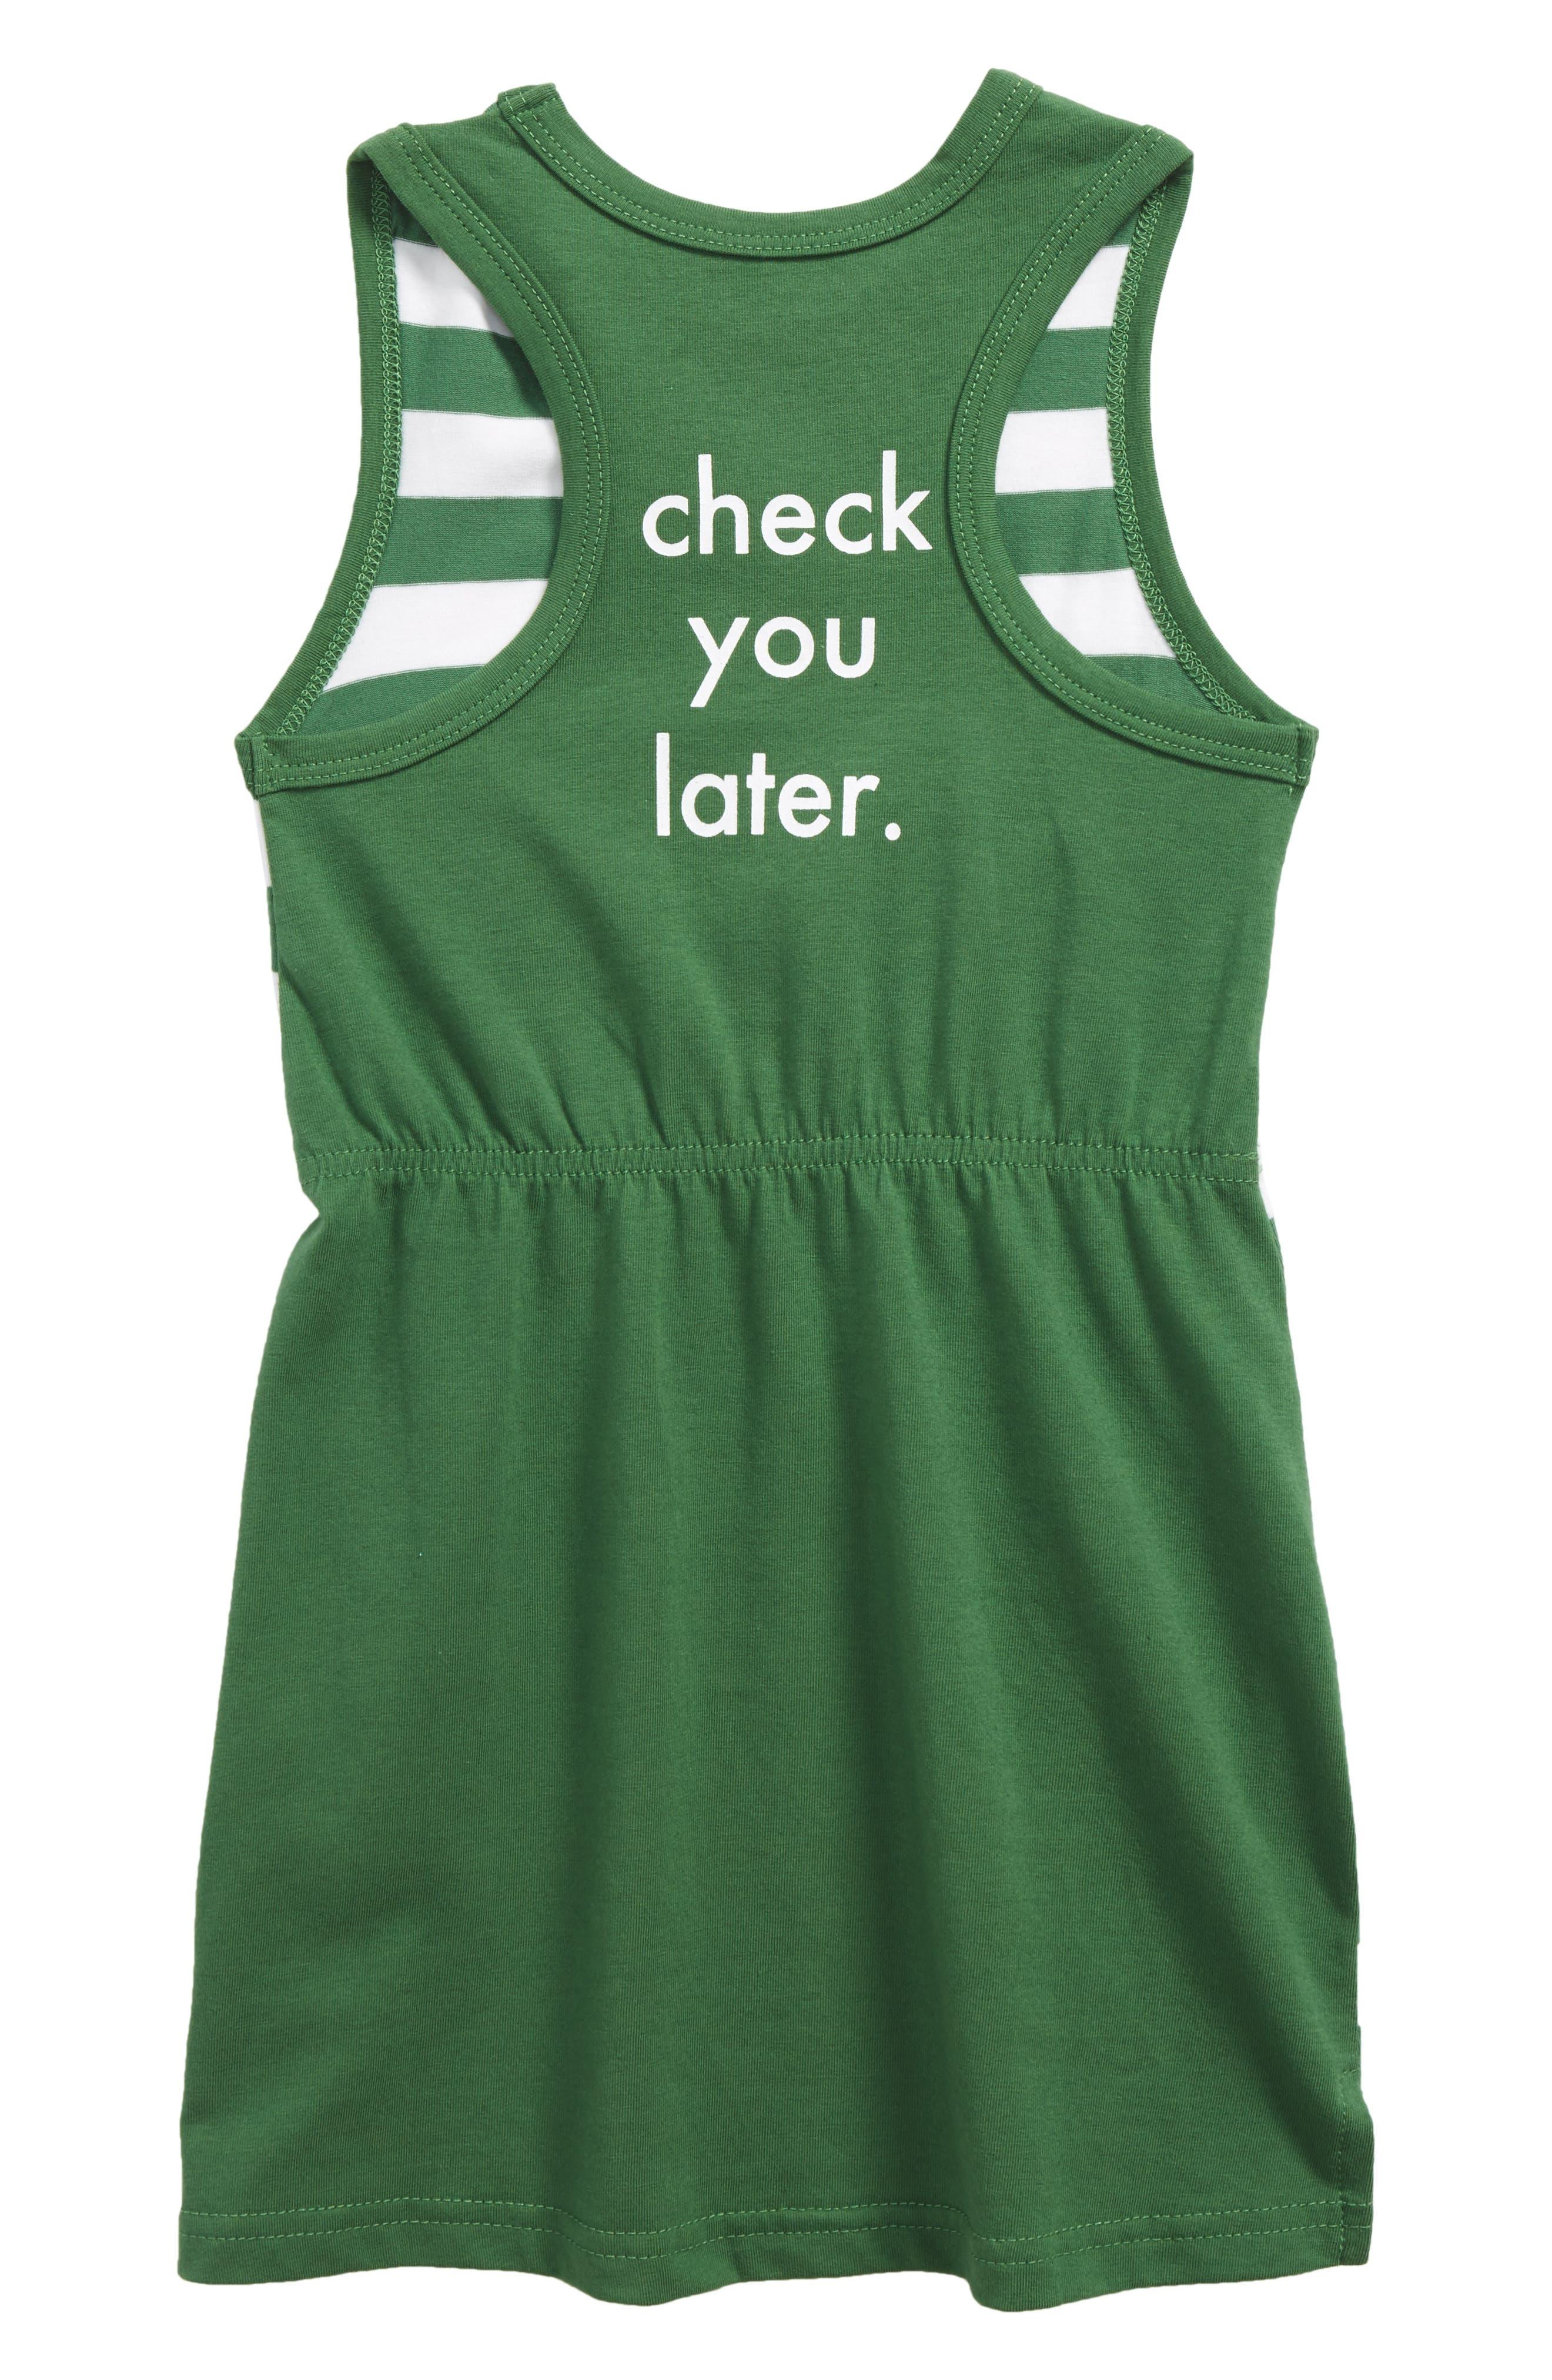 Alternate Image 2  - Tiny Tribe Check You Later Racerback Dress (Toddler Girls & Little Girls)